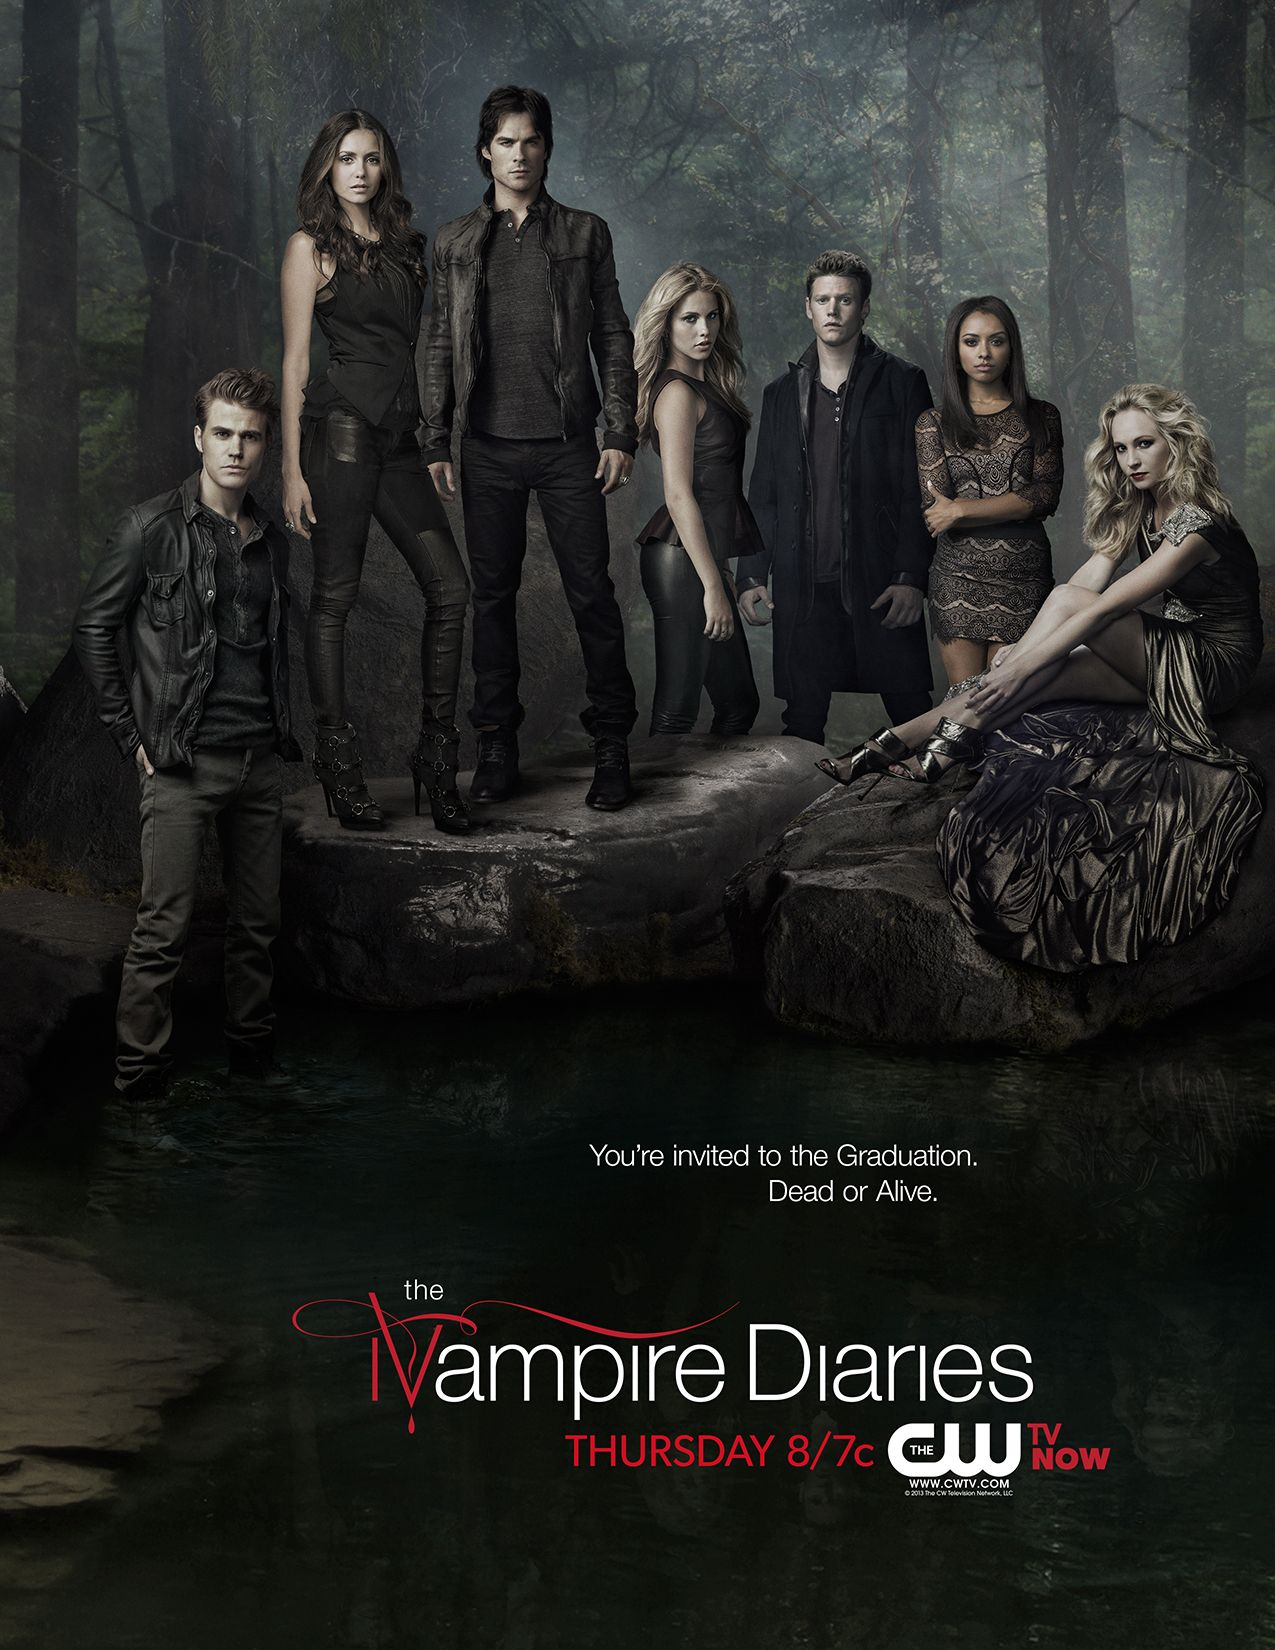 The Vampire Diaries Vampire Diaries Season 5 Vampire Diaries